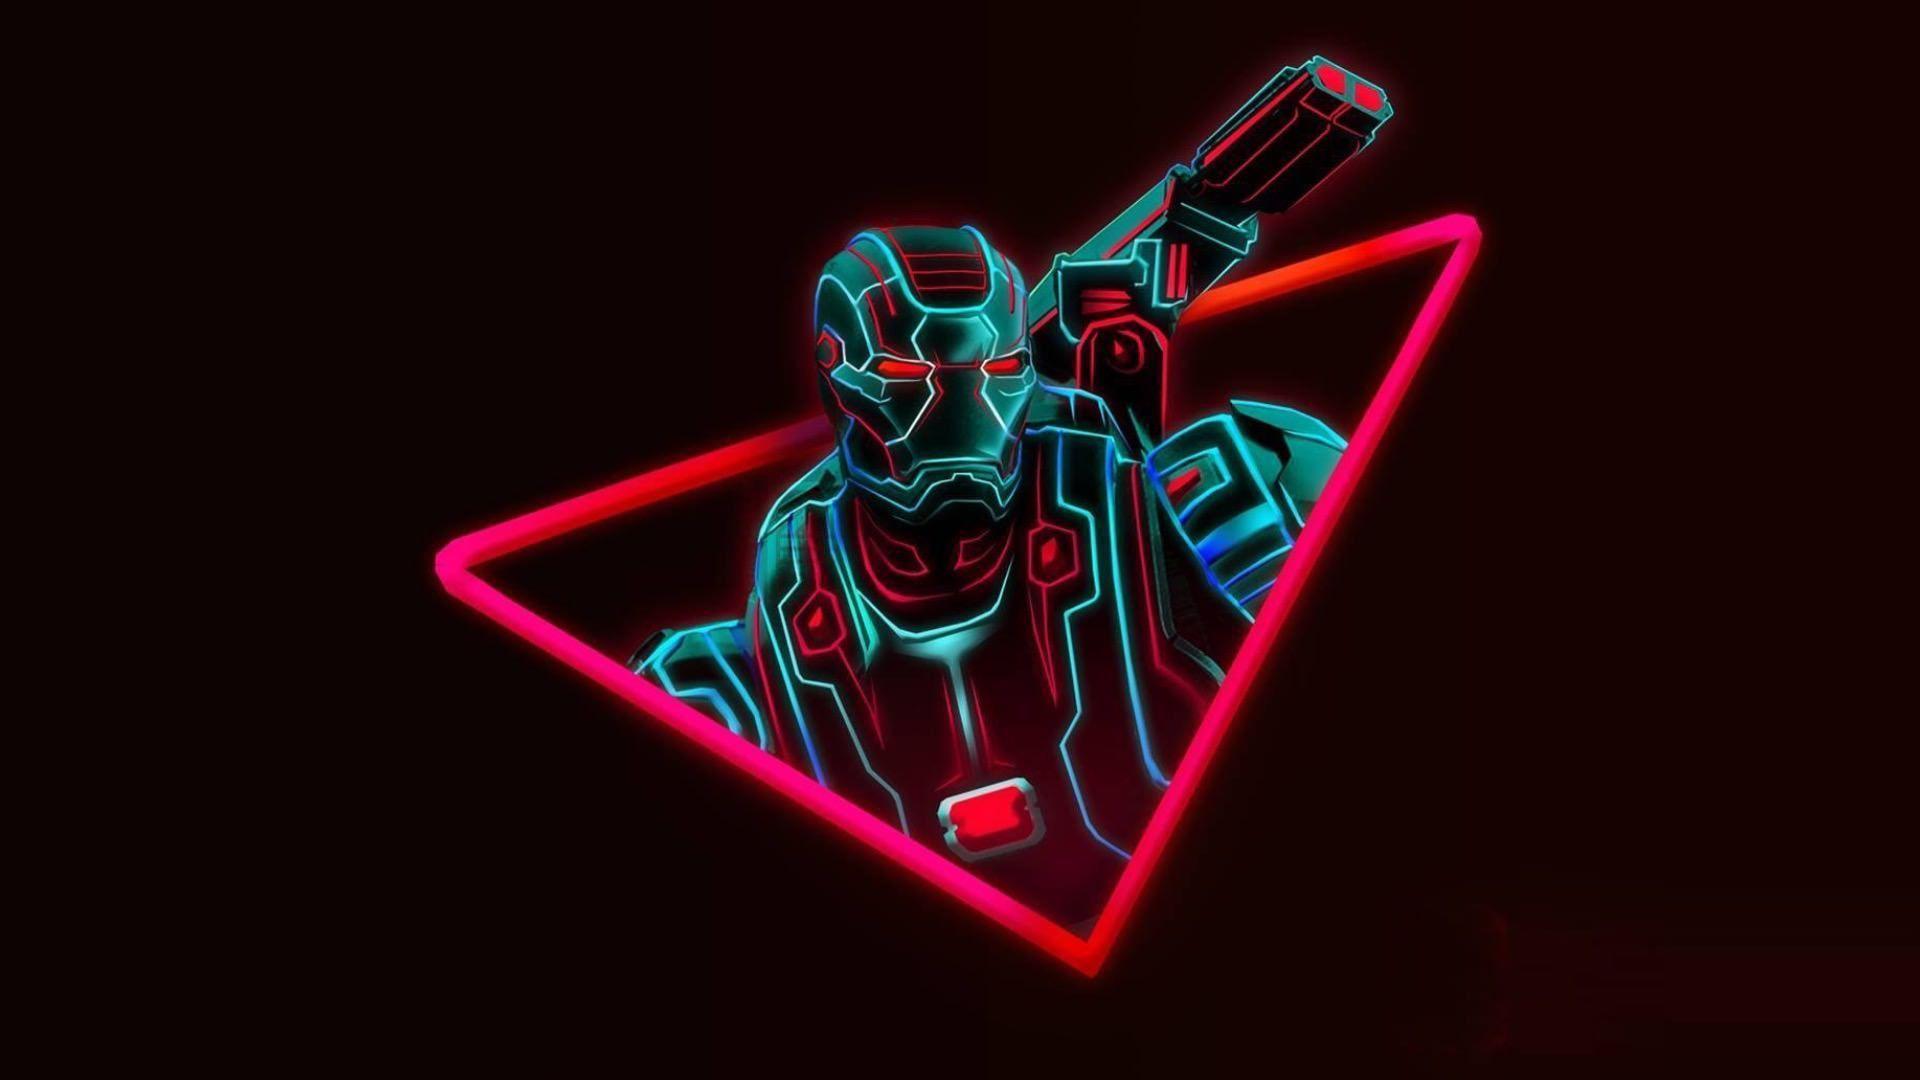 Avengers Neon Wallpapers - Wallpaper Cave